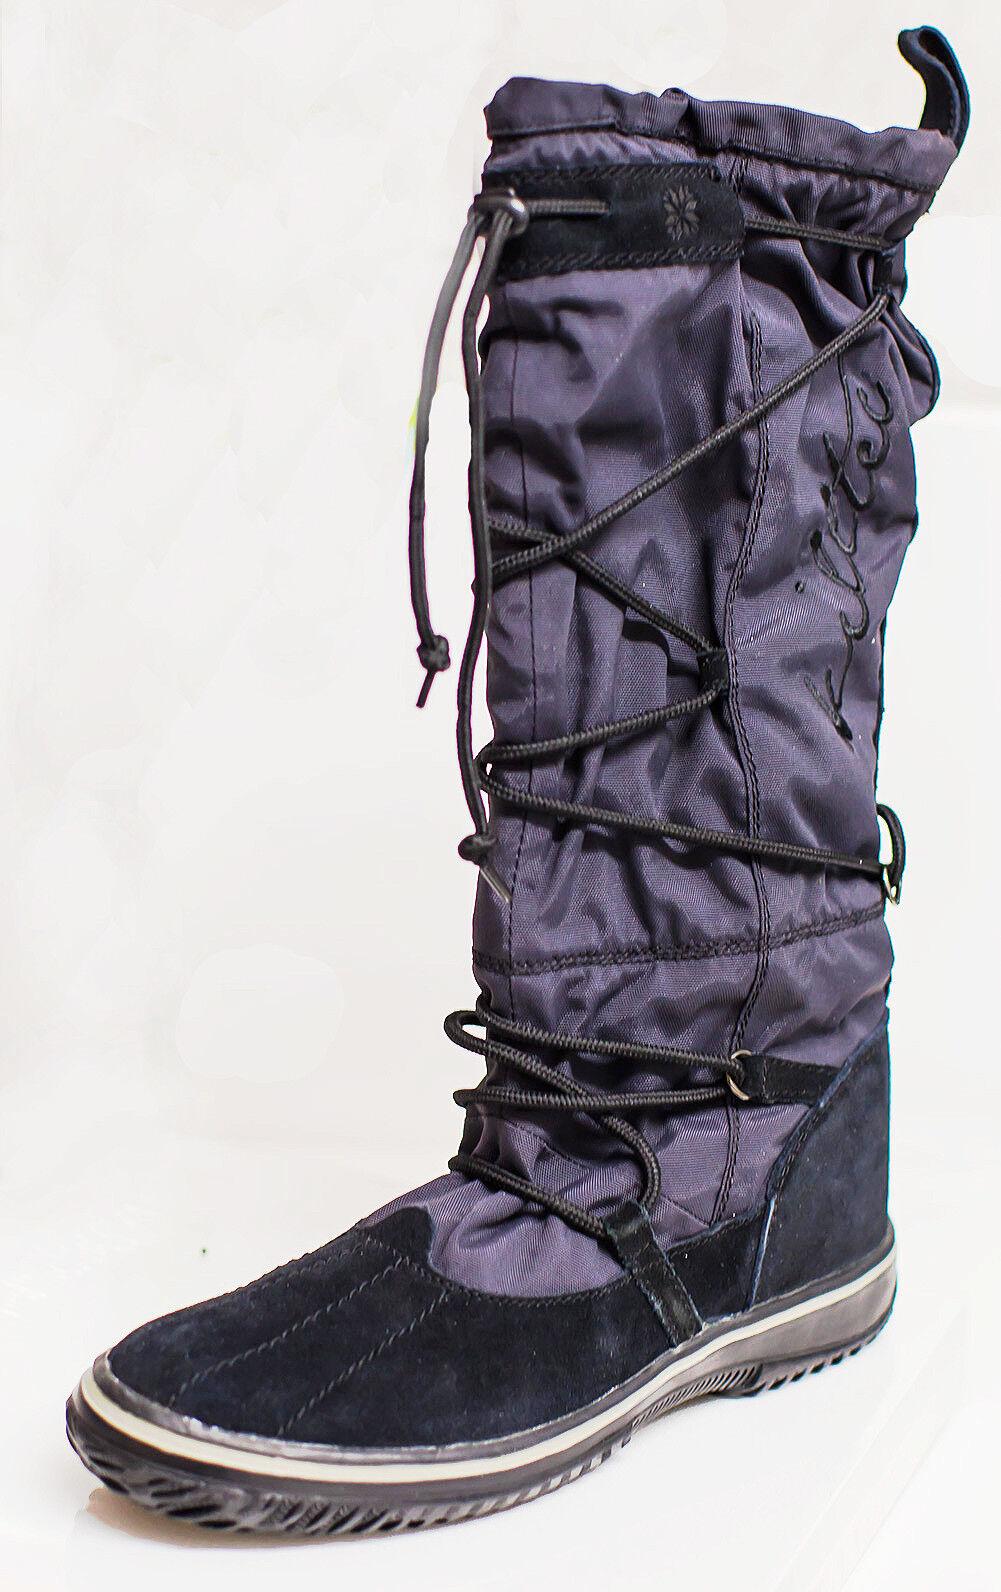 Killtec Damenstiefel, hohe Snowboots Kenai, schwarz, Gr 40, neu